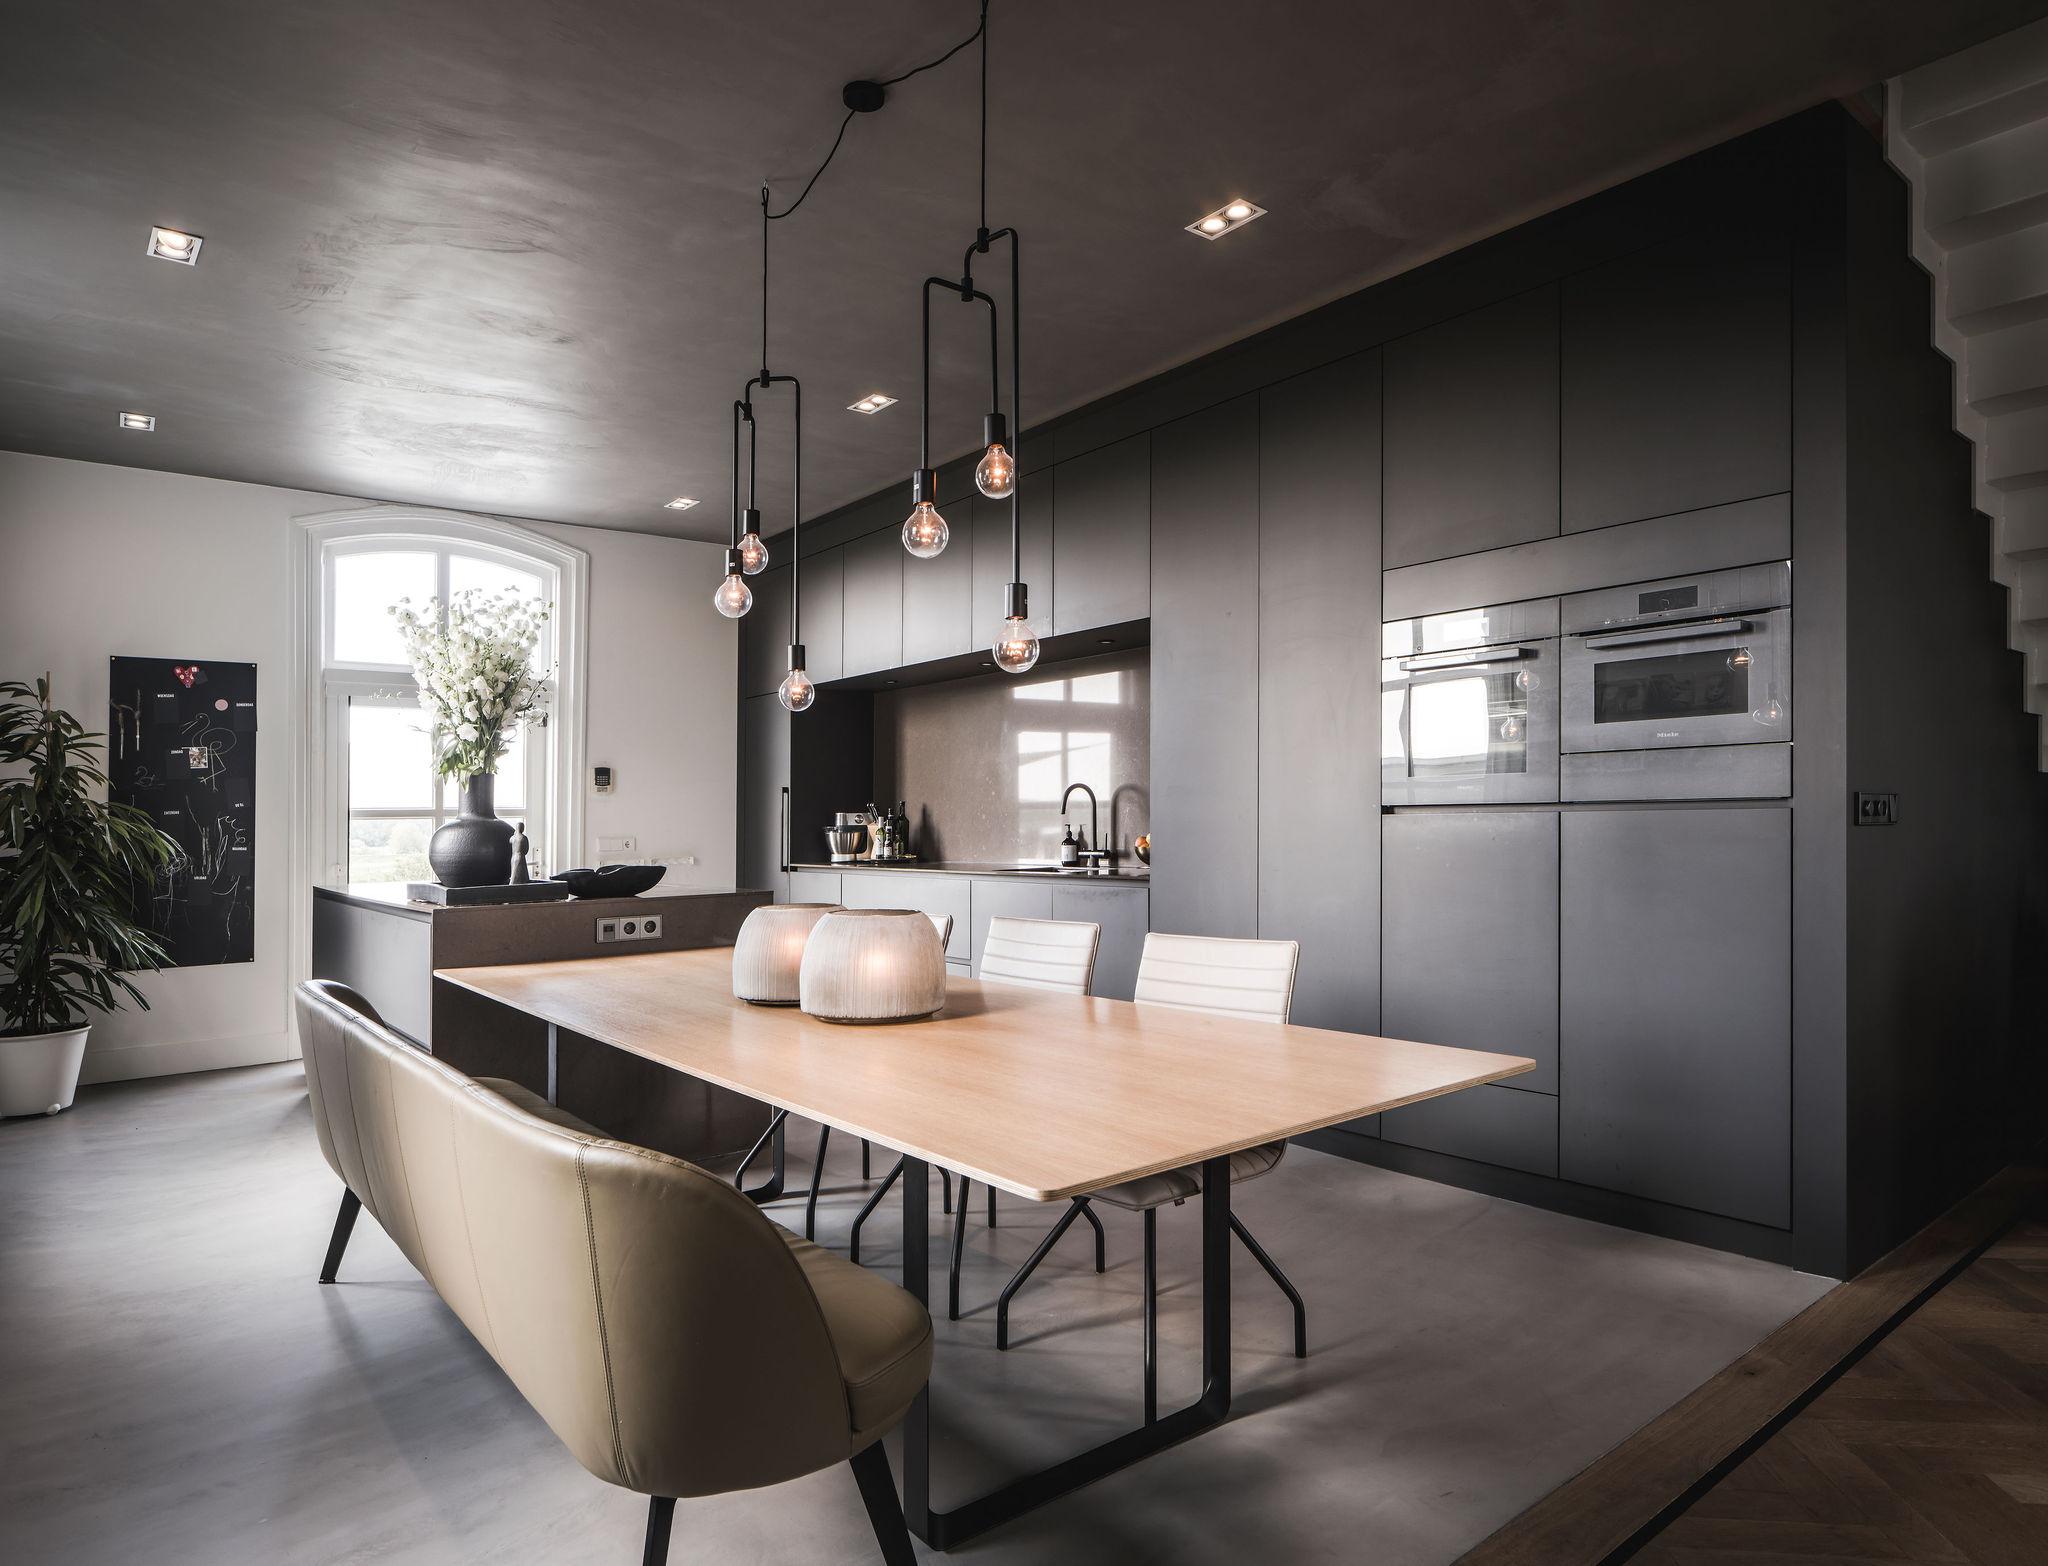 interieurarchitect-Stan-Wildenberg-interieur-interiordesign-luxurylifestyle-luxuryinteriors-luxuryhomes-vide-trap-glasballustrade-Peter-Baas-Photography-keuken bank